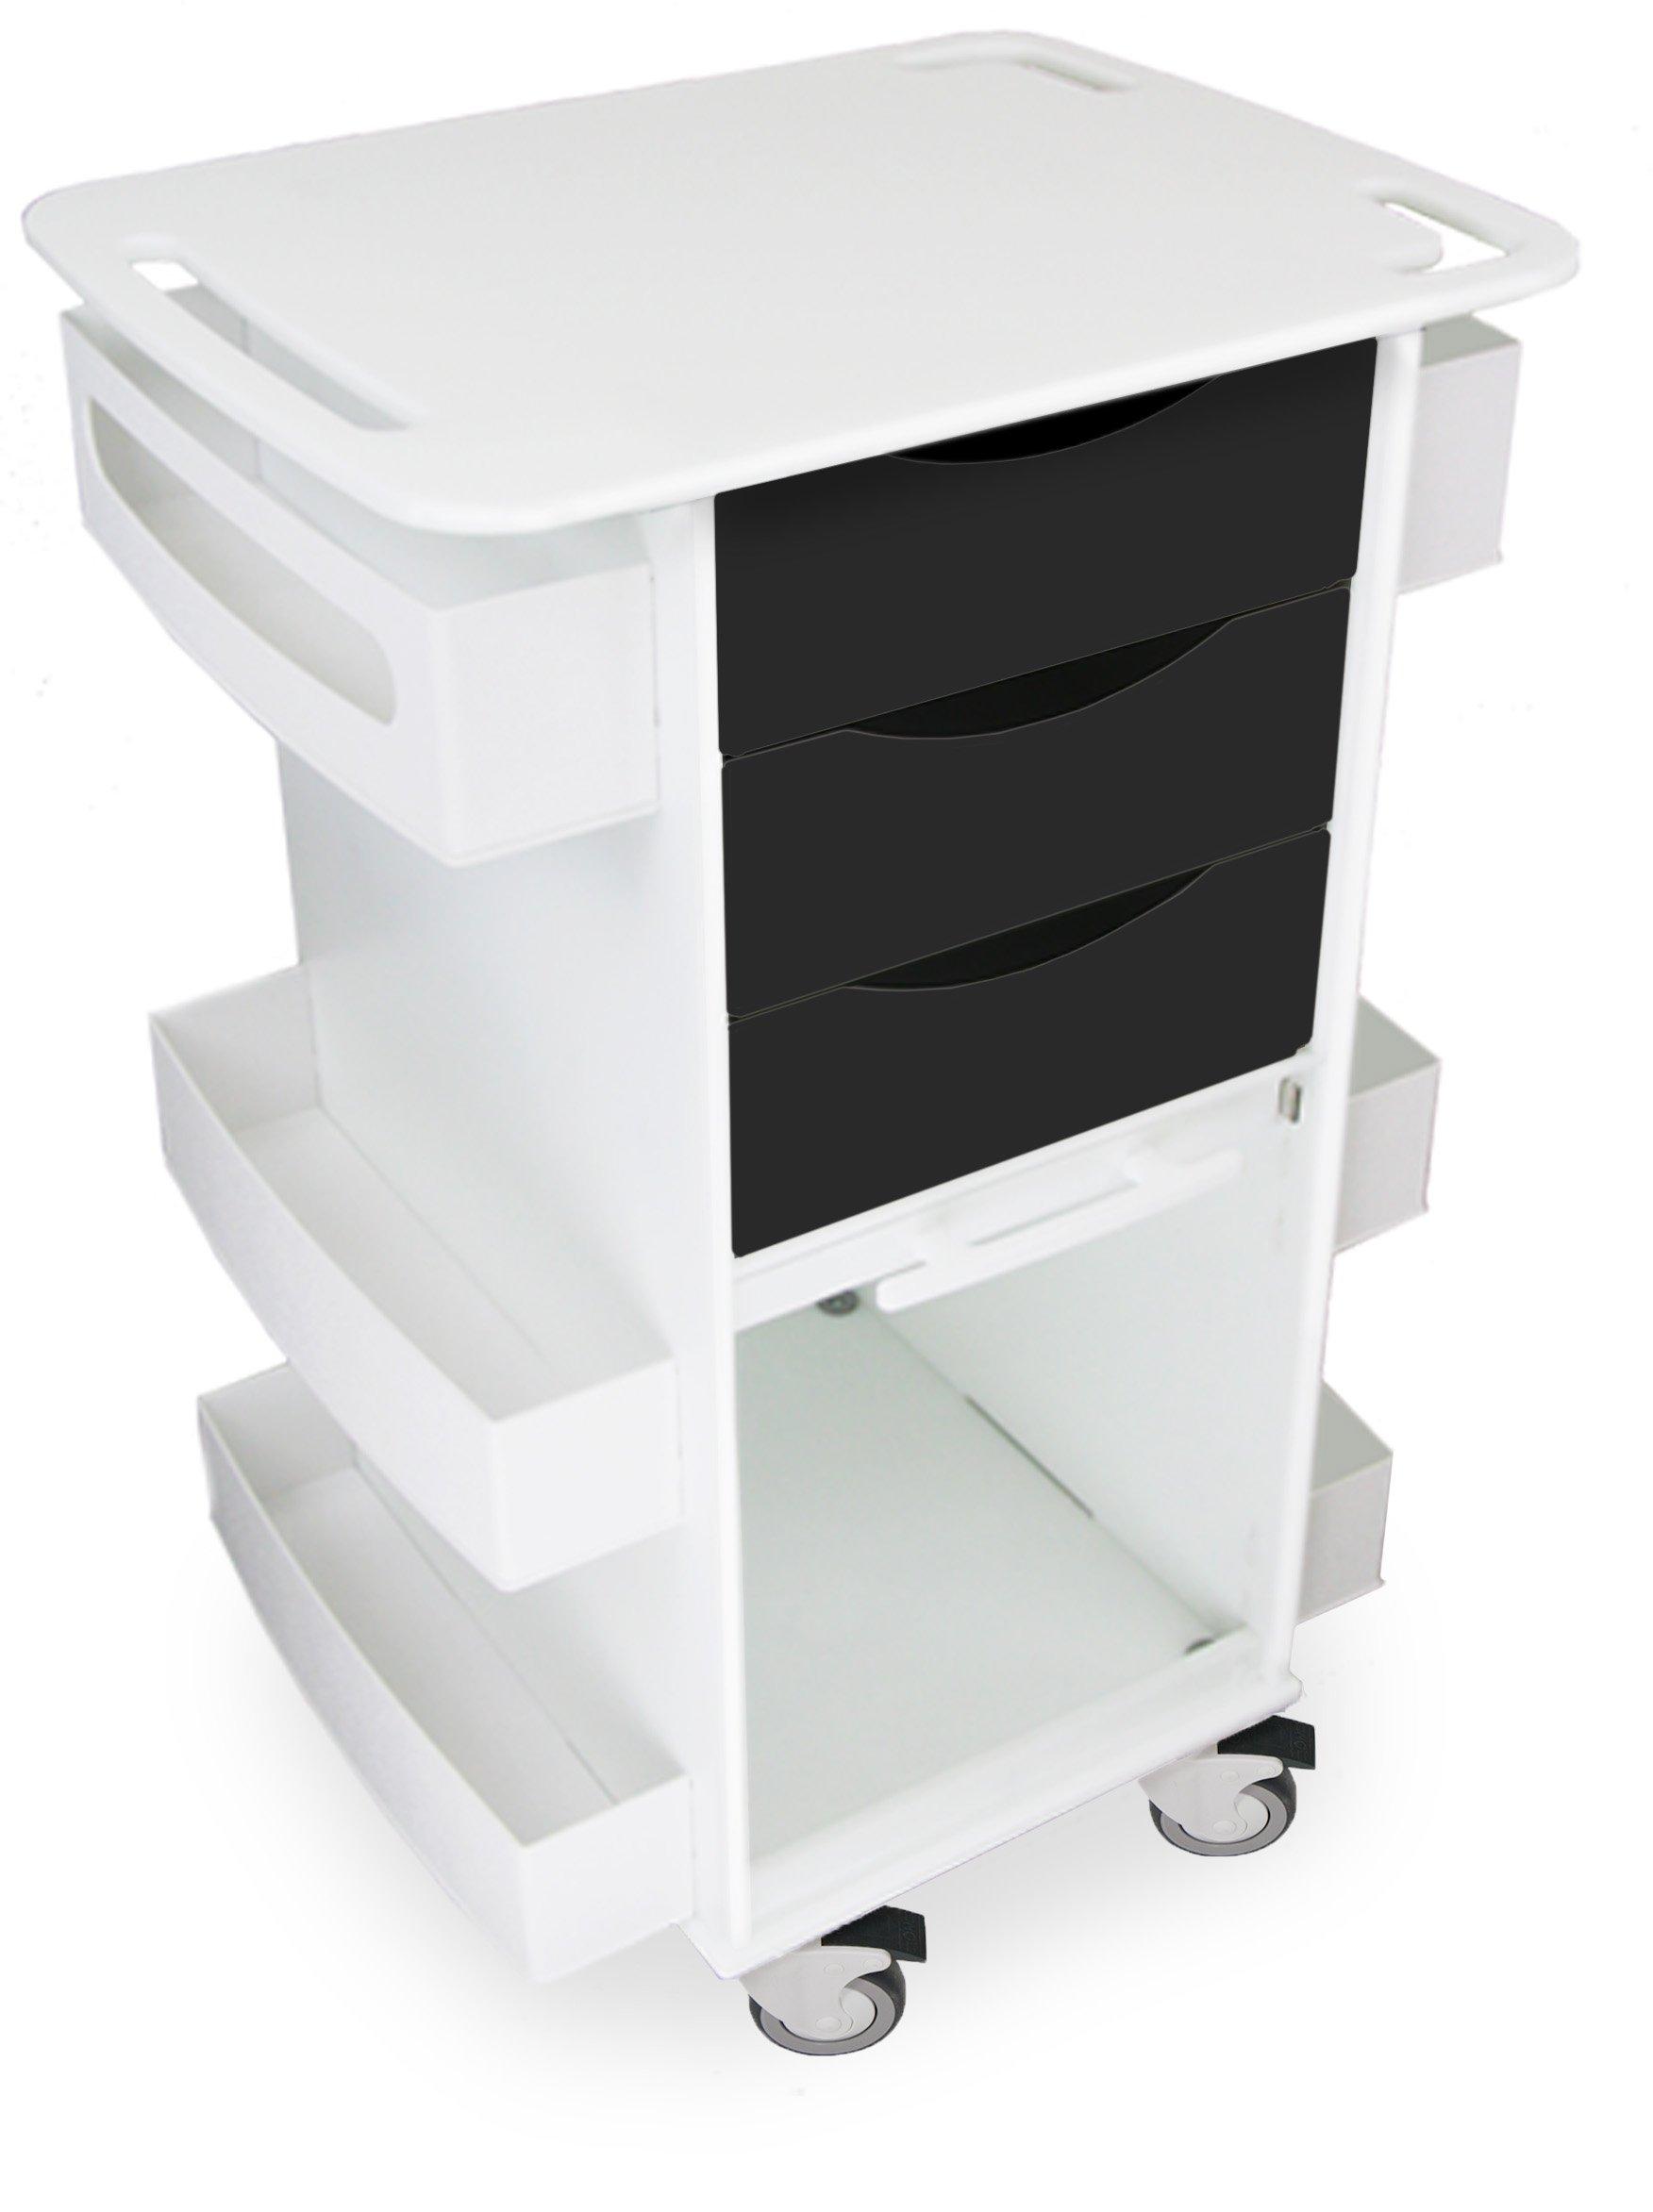 TrippNT 51369 Polyethylene/ABS Locking Core DX Multi-Tasking Storage Cart with Clear PETG Sliding Door, 23'' Width x 35'' Height x 19'' Depth, Black